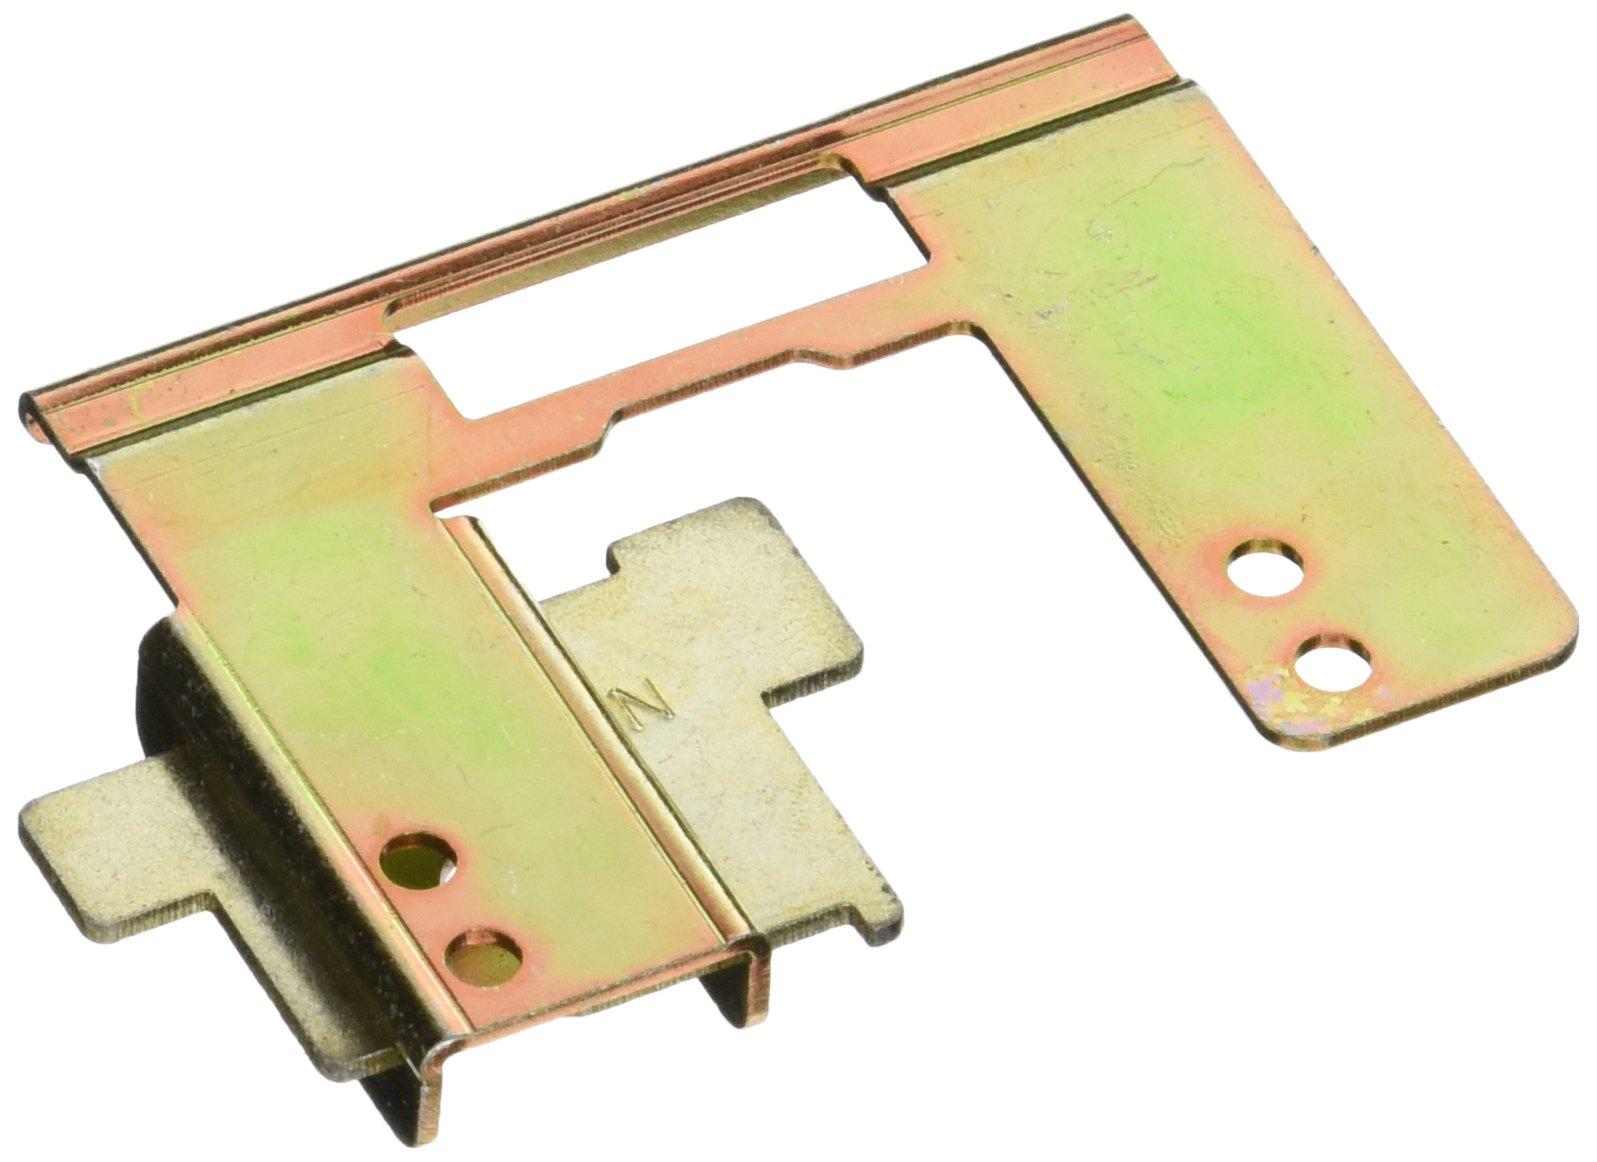 Siemens ECSBPK07 Standby Power Mechanical Interlock for Use on Meter Combinations